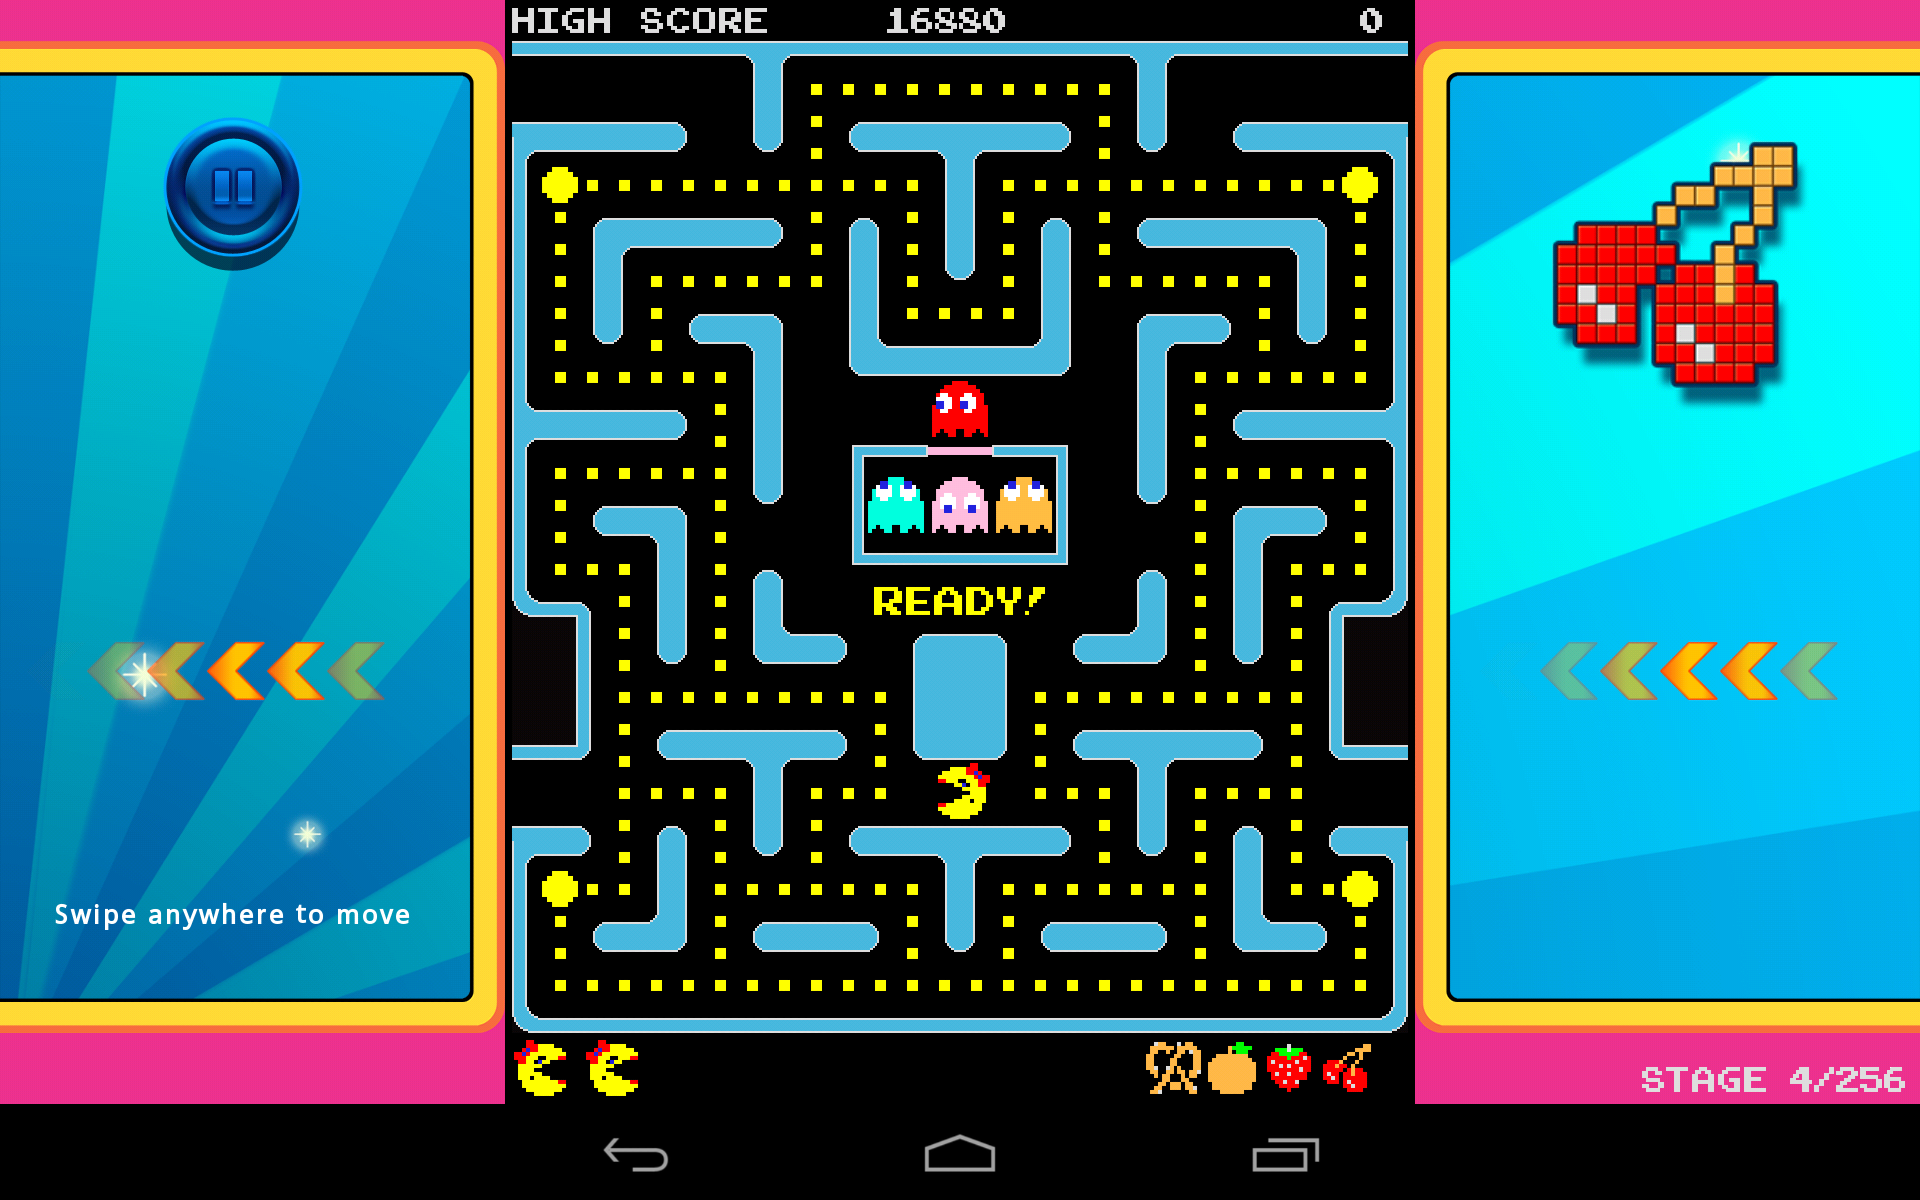 Ms. PAC-MAN by Namco screenshot #7